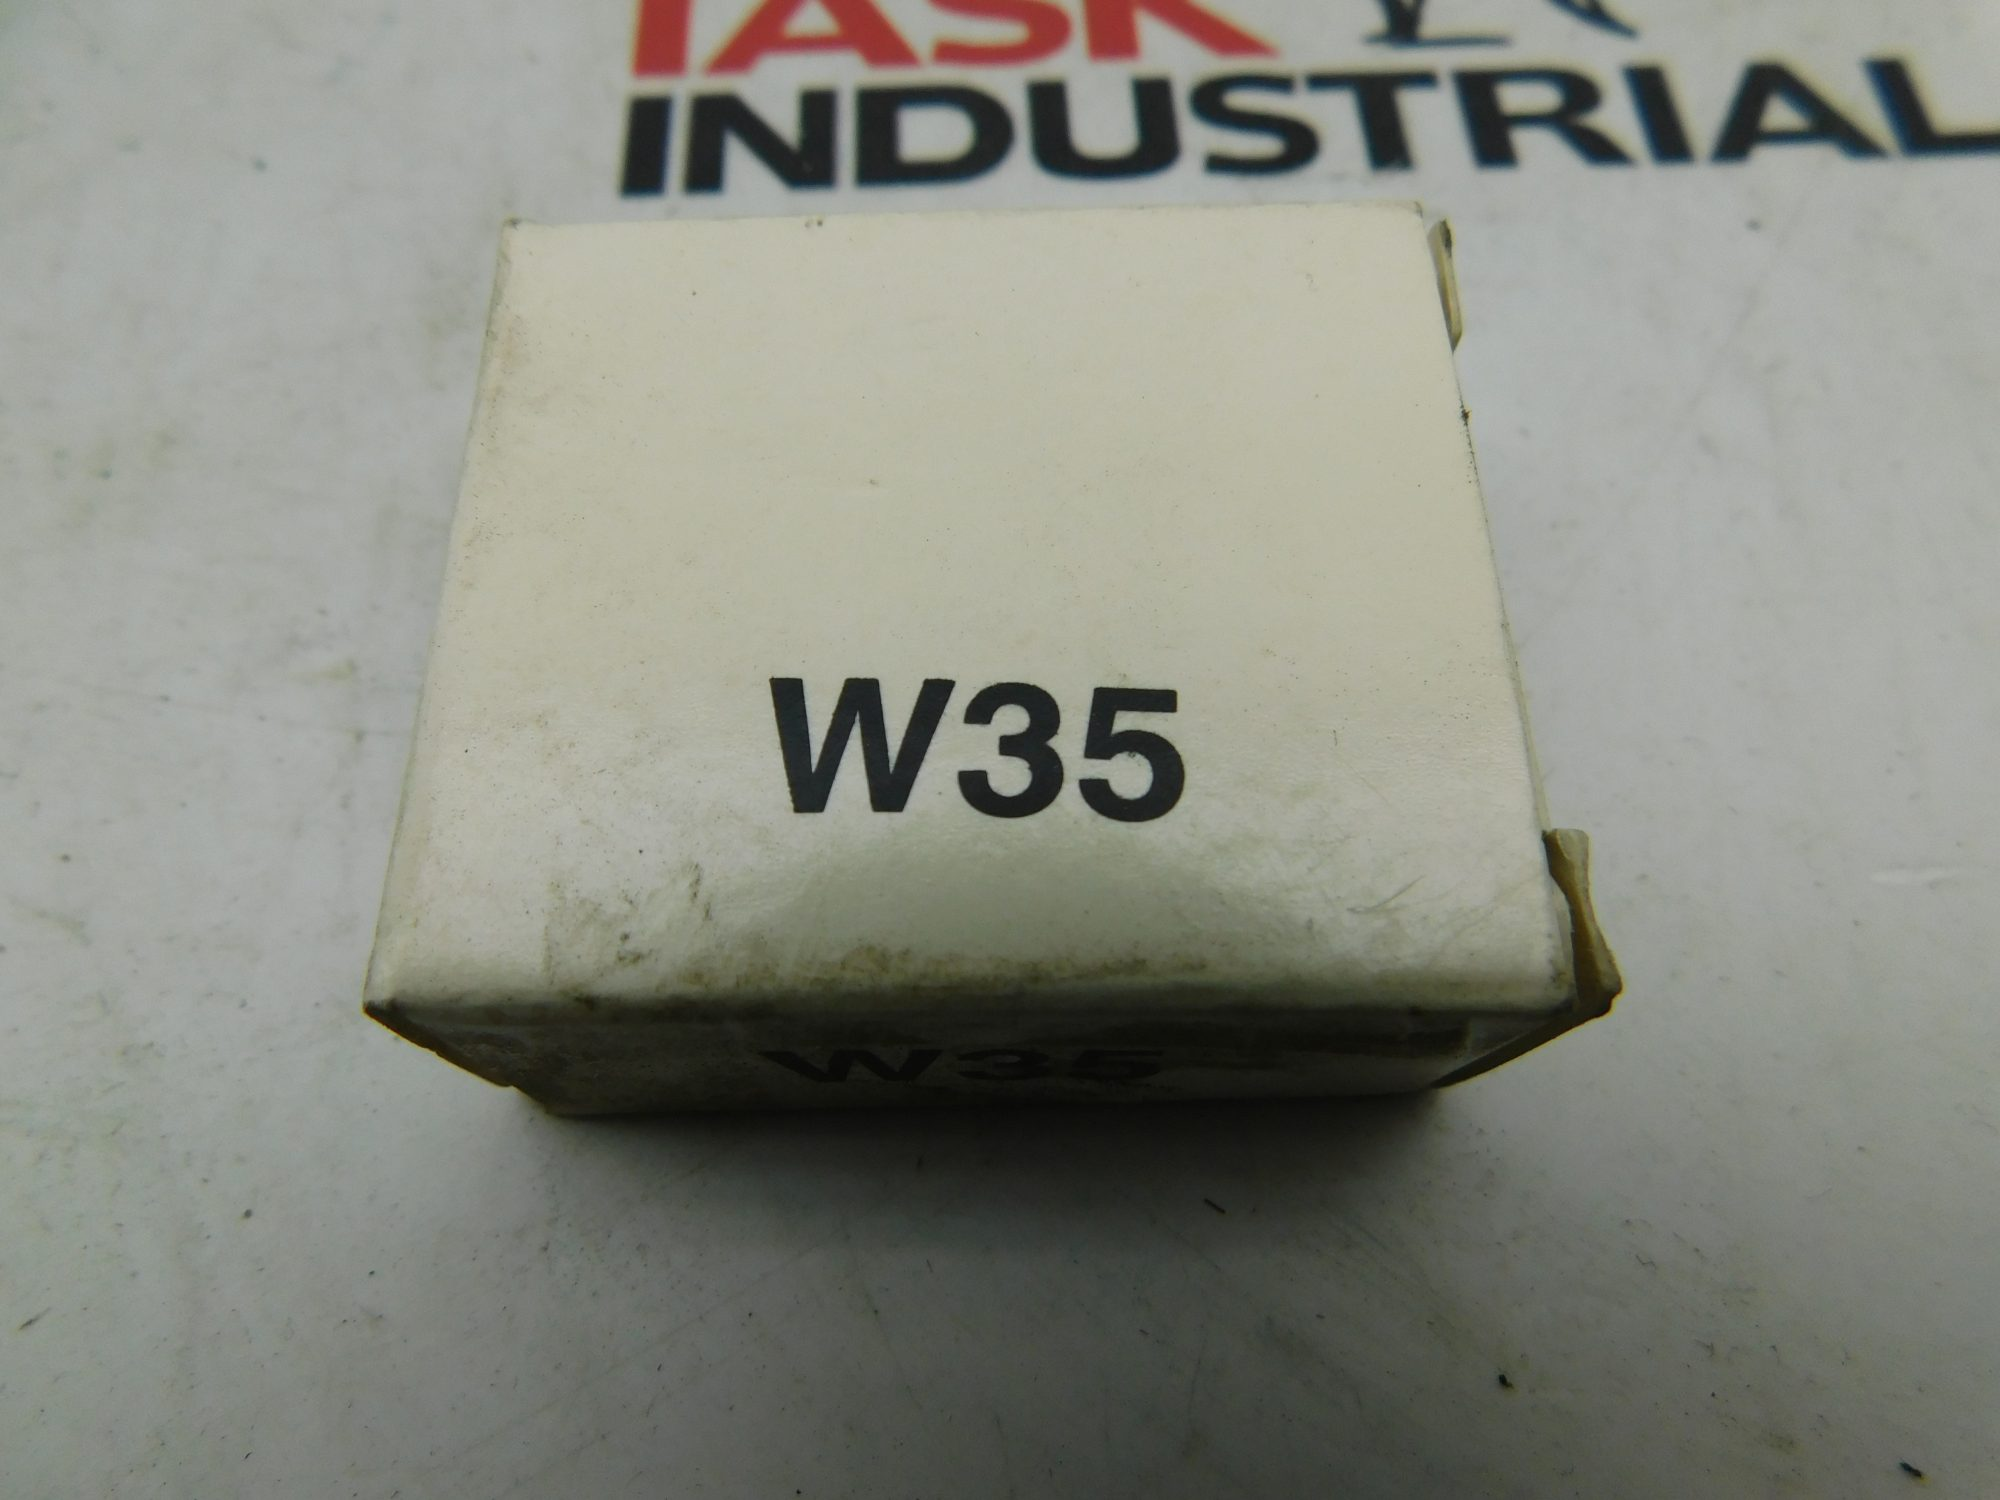 Allen-Bradley W35 Heater Element, New In Box